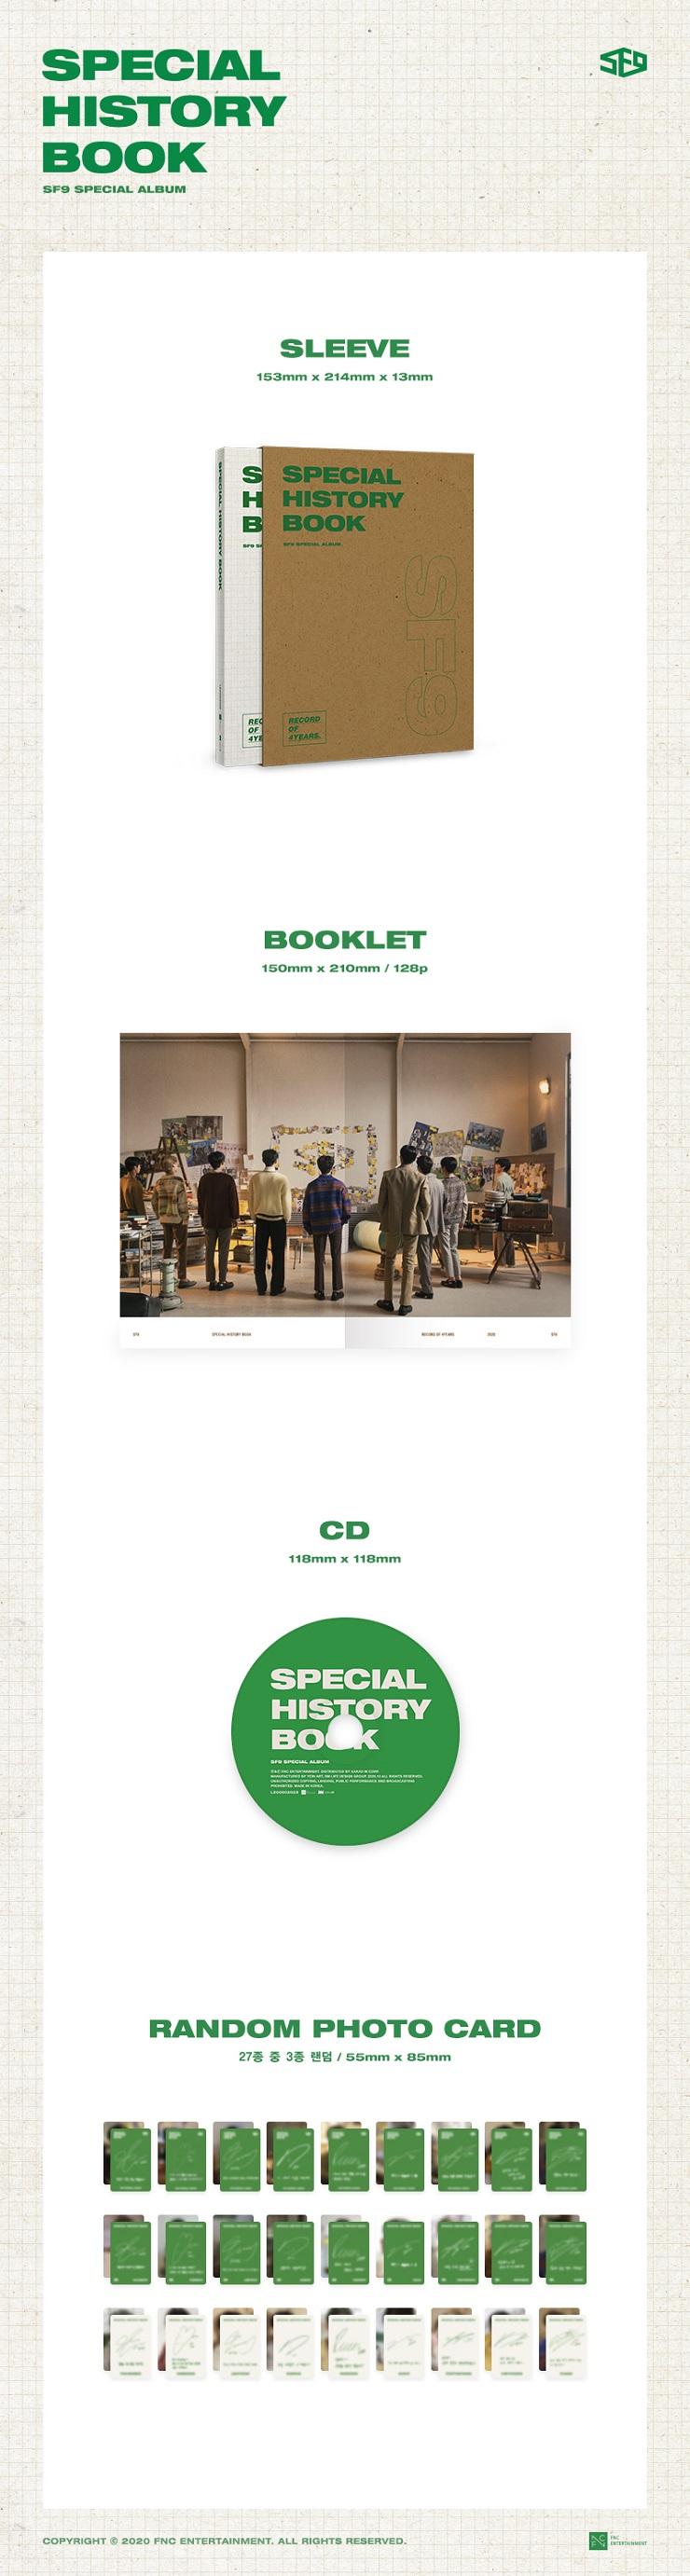 SF9 - Special Album SPECIAL HISTORY BOOK